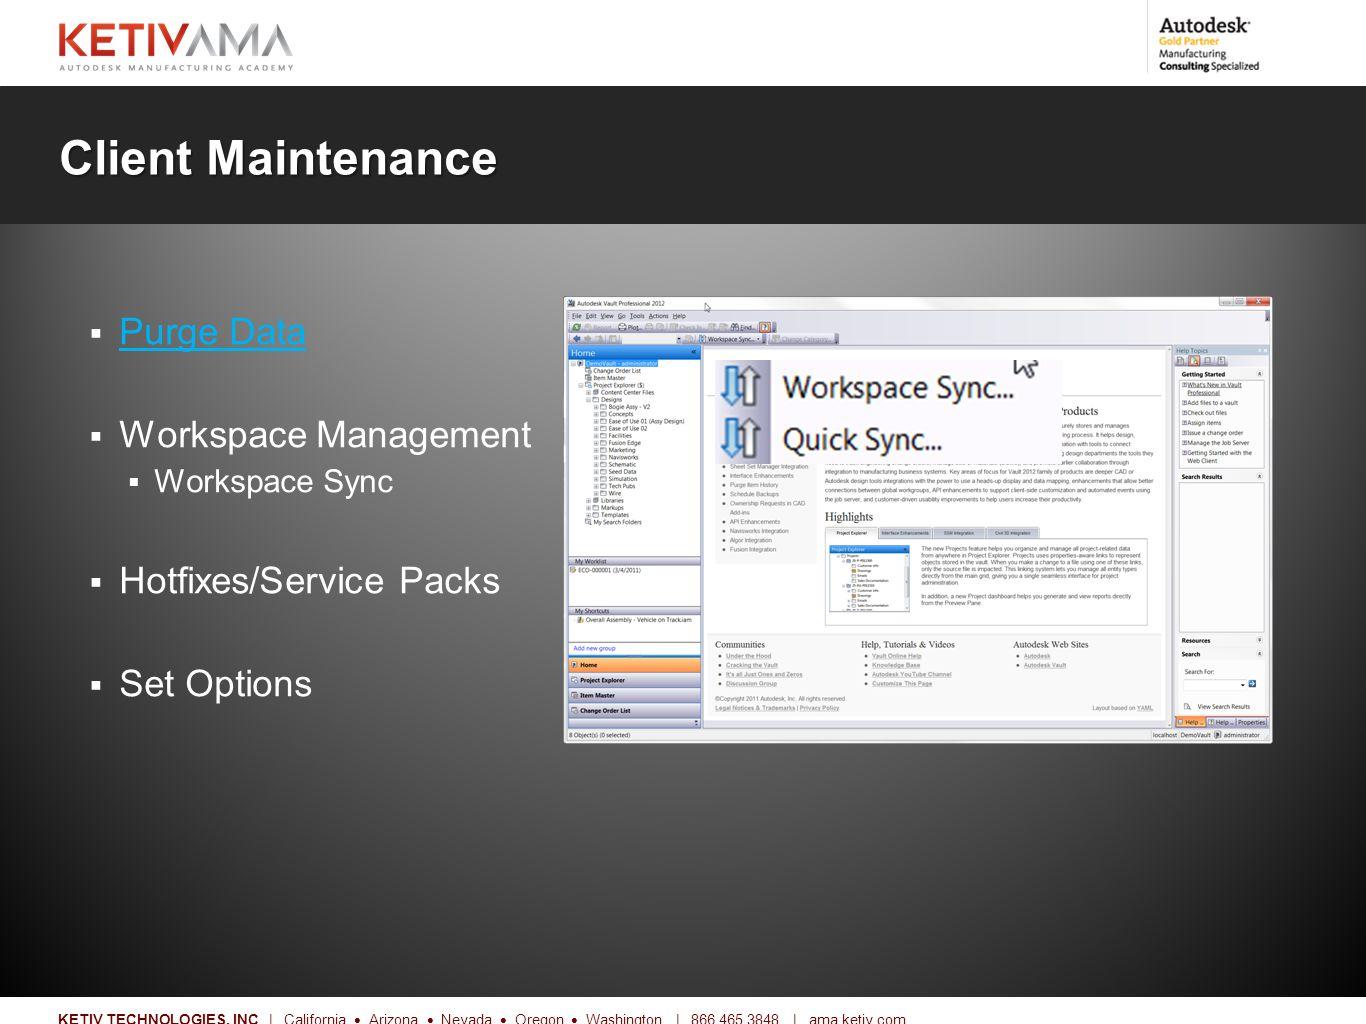 Title KETIV TECHNOLOGIES, INC   California  Arizona  Nevada  Oregon  Washington   866.465.3848   ama.ketiv.com Client Maintenance  Purge Data Purge Data  Workspace Management  Workspace Sync  Hotfixes/Service Packs  Set Options